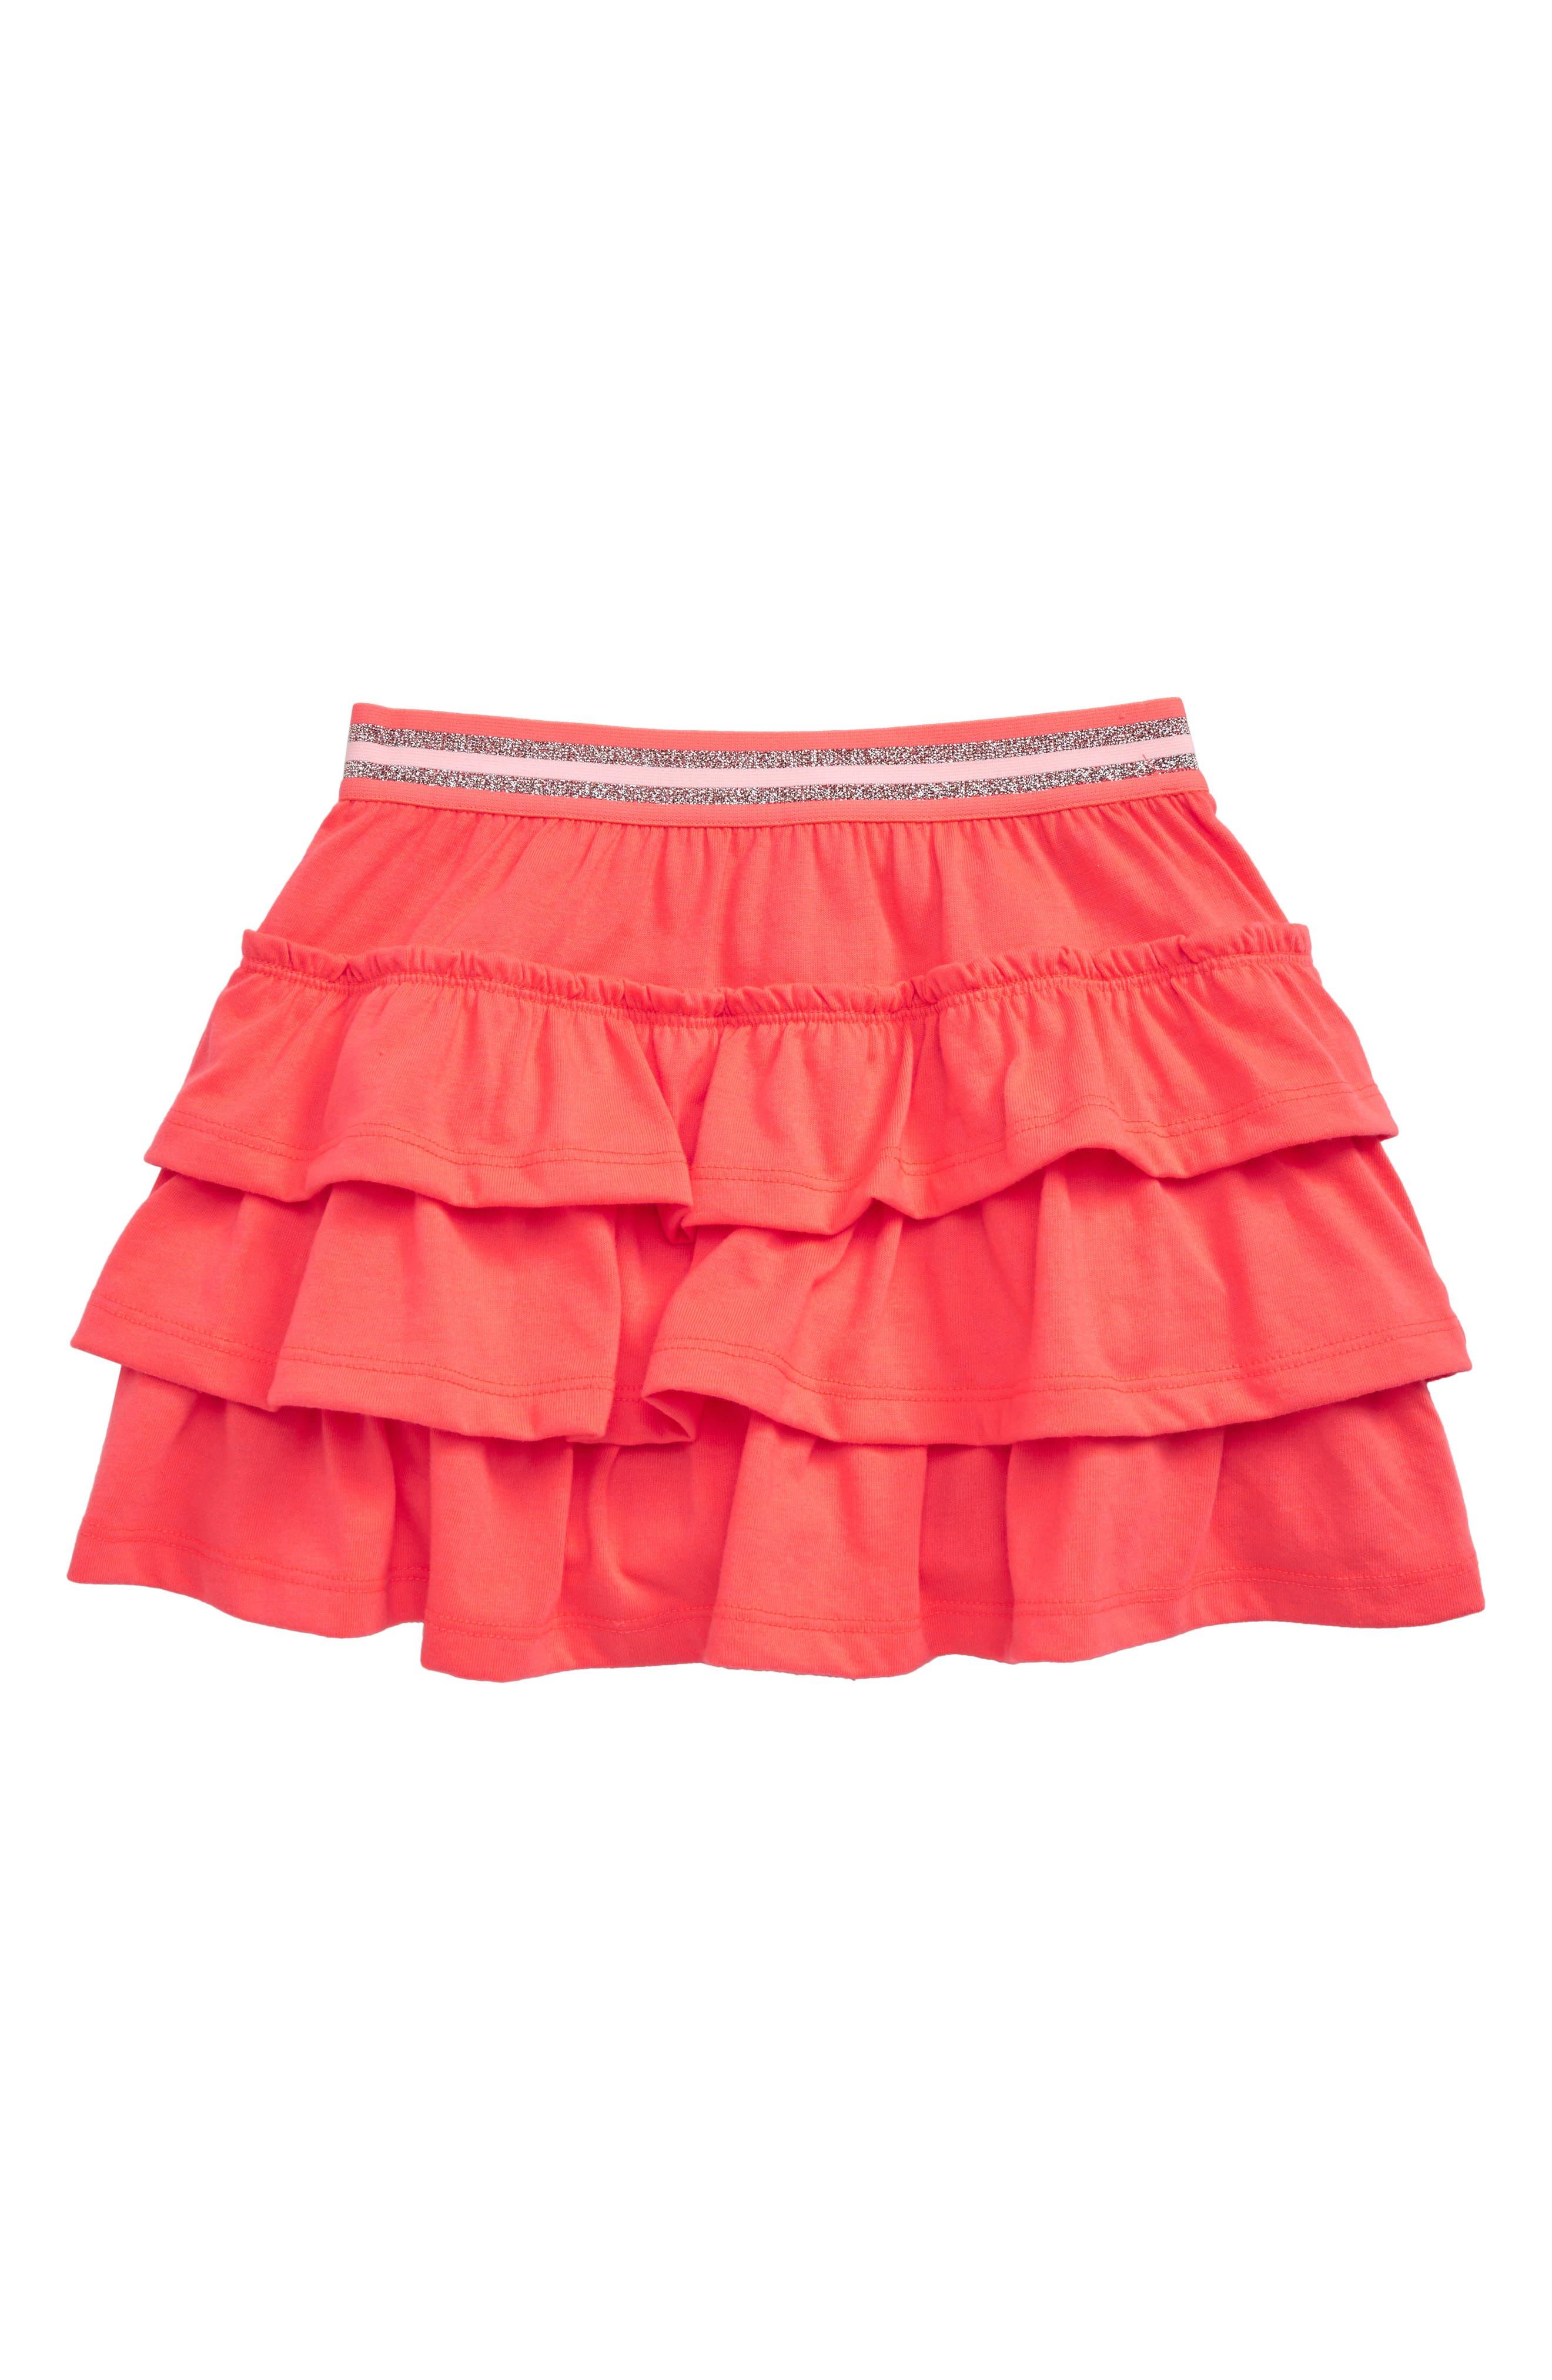 Toddler Girls Mini Boden Pretty Jersey Ruffle Skort Size 34Y  Pink